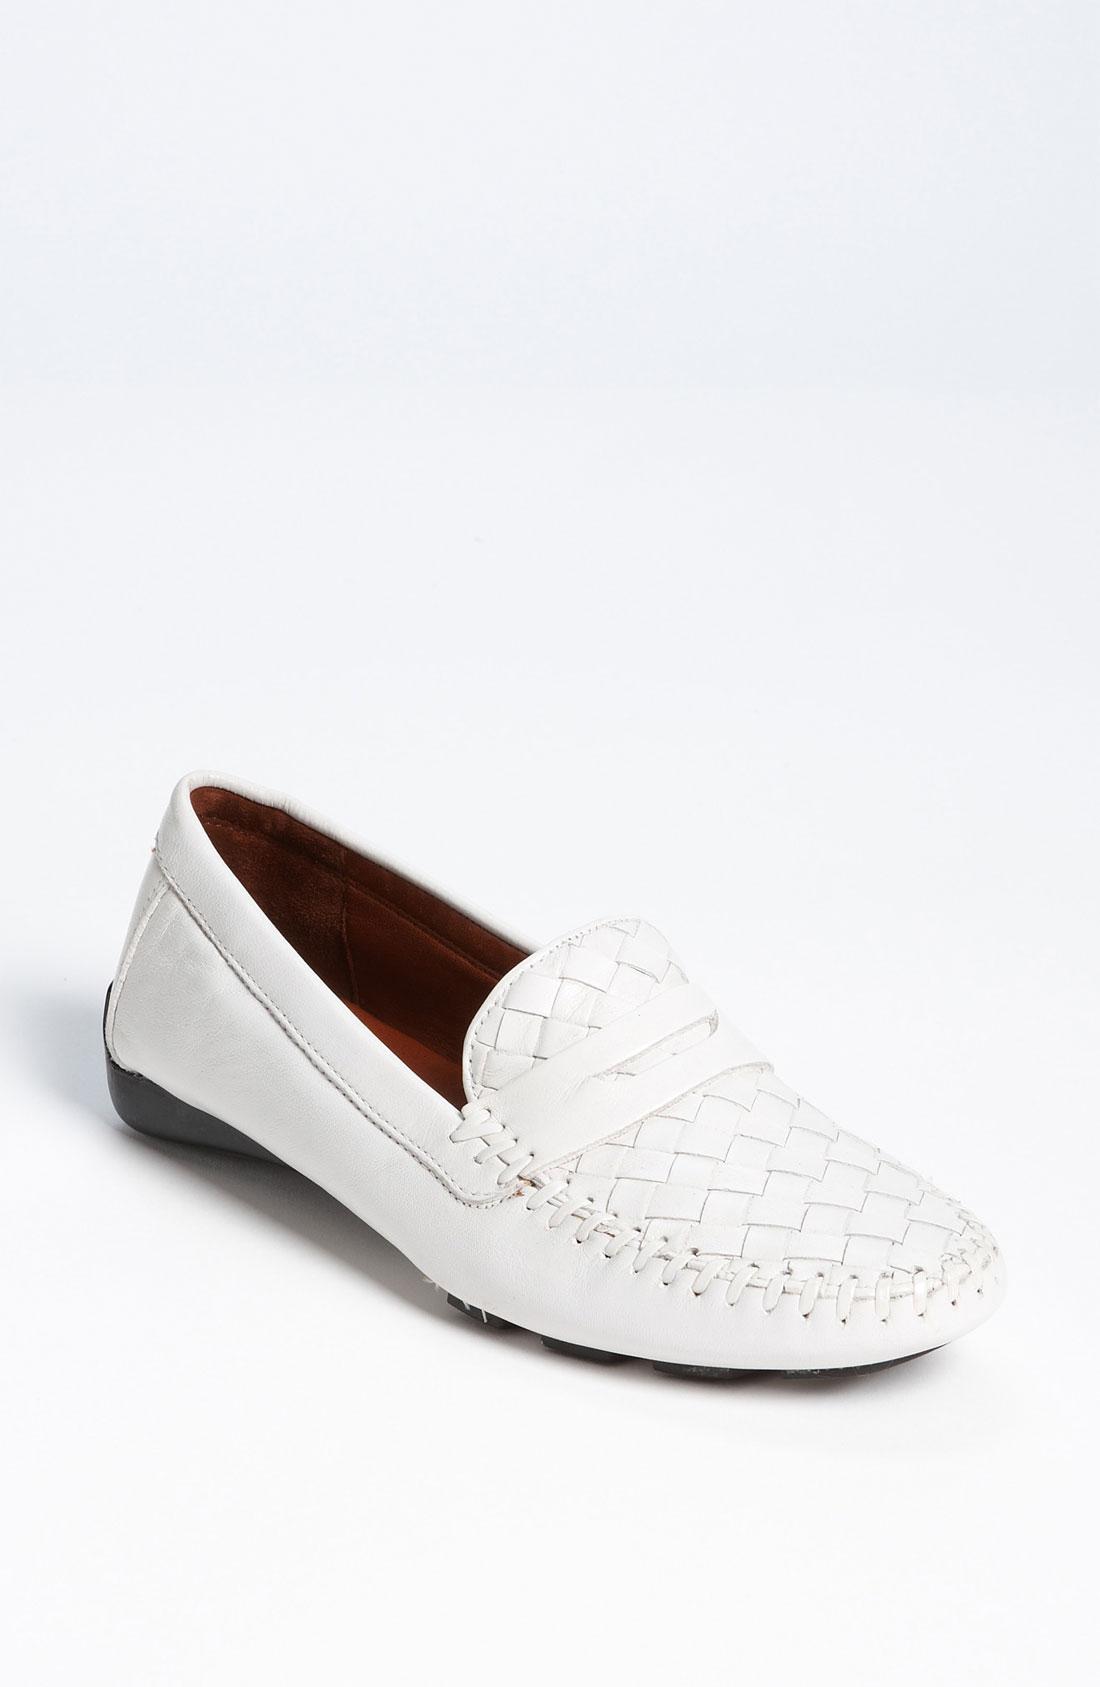 Asos White Glove Shoe